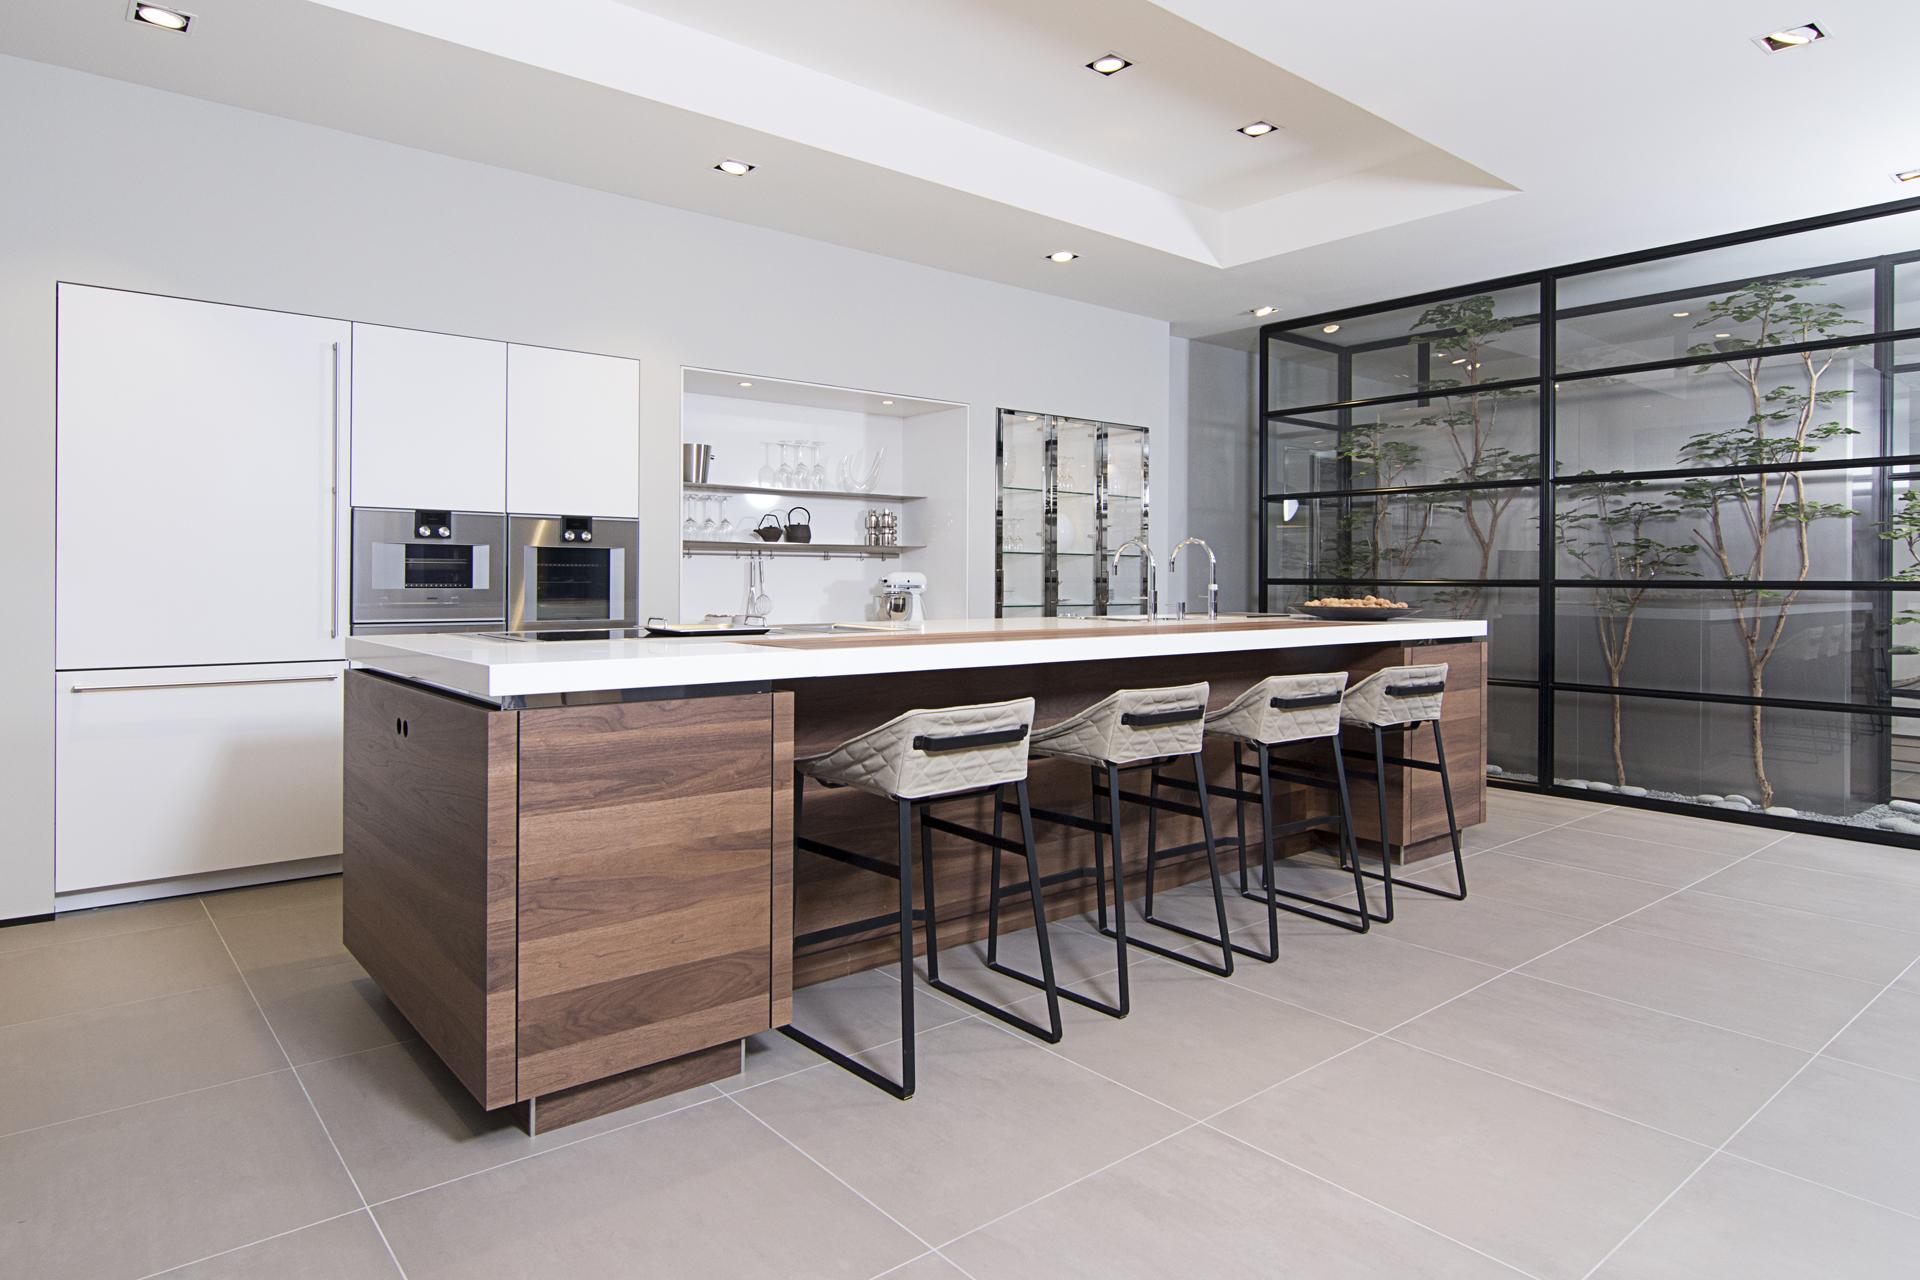 Siematic image store helmond aswa keukens